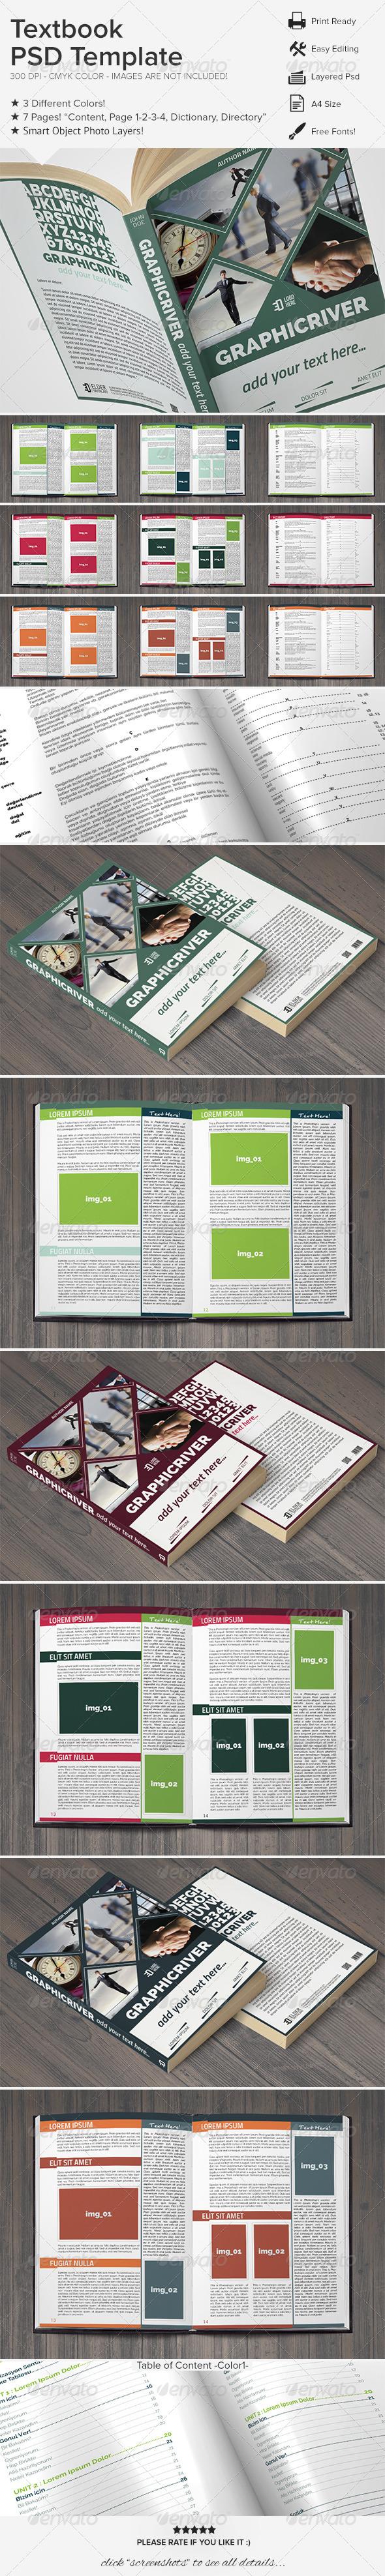 Textbook PSD Template - Miscellaneous Print Templates